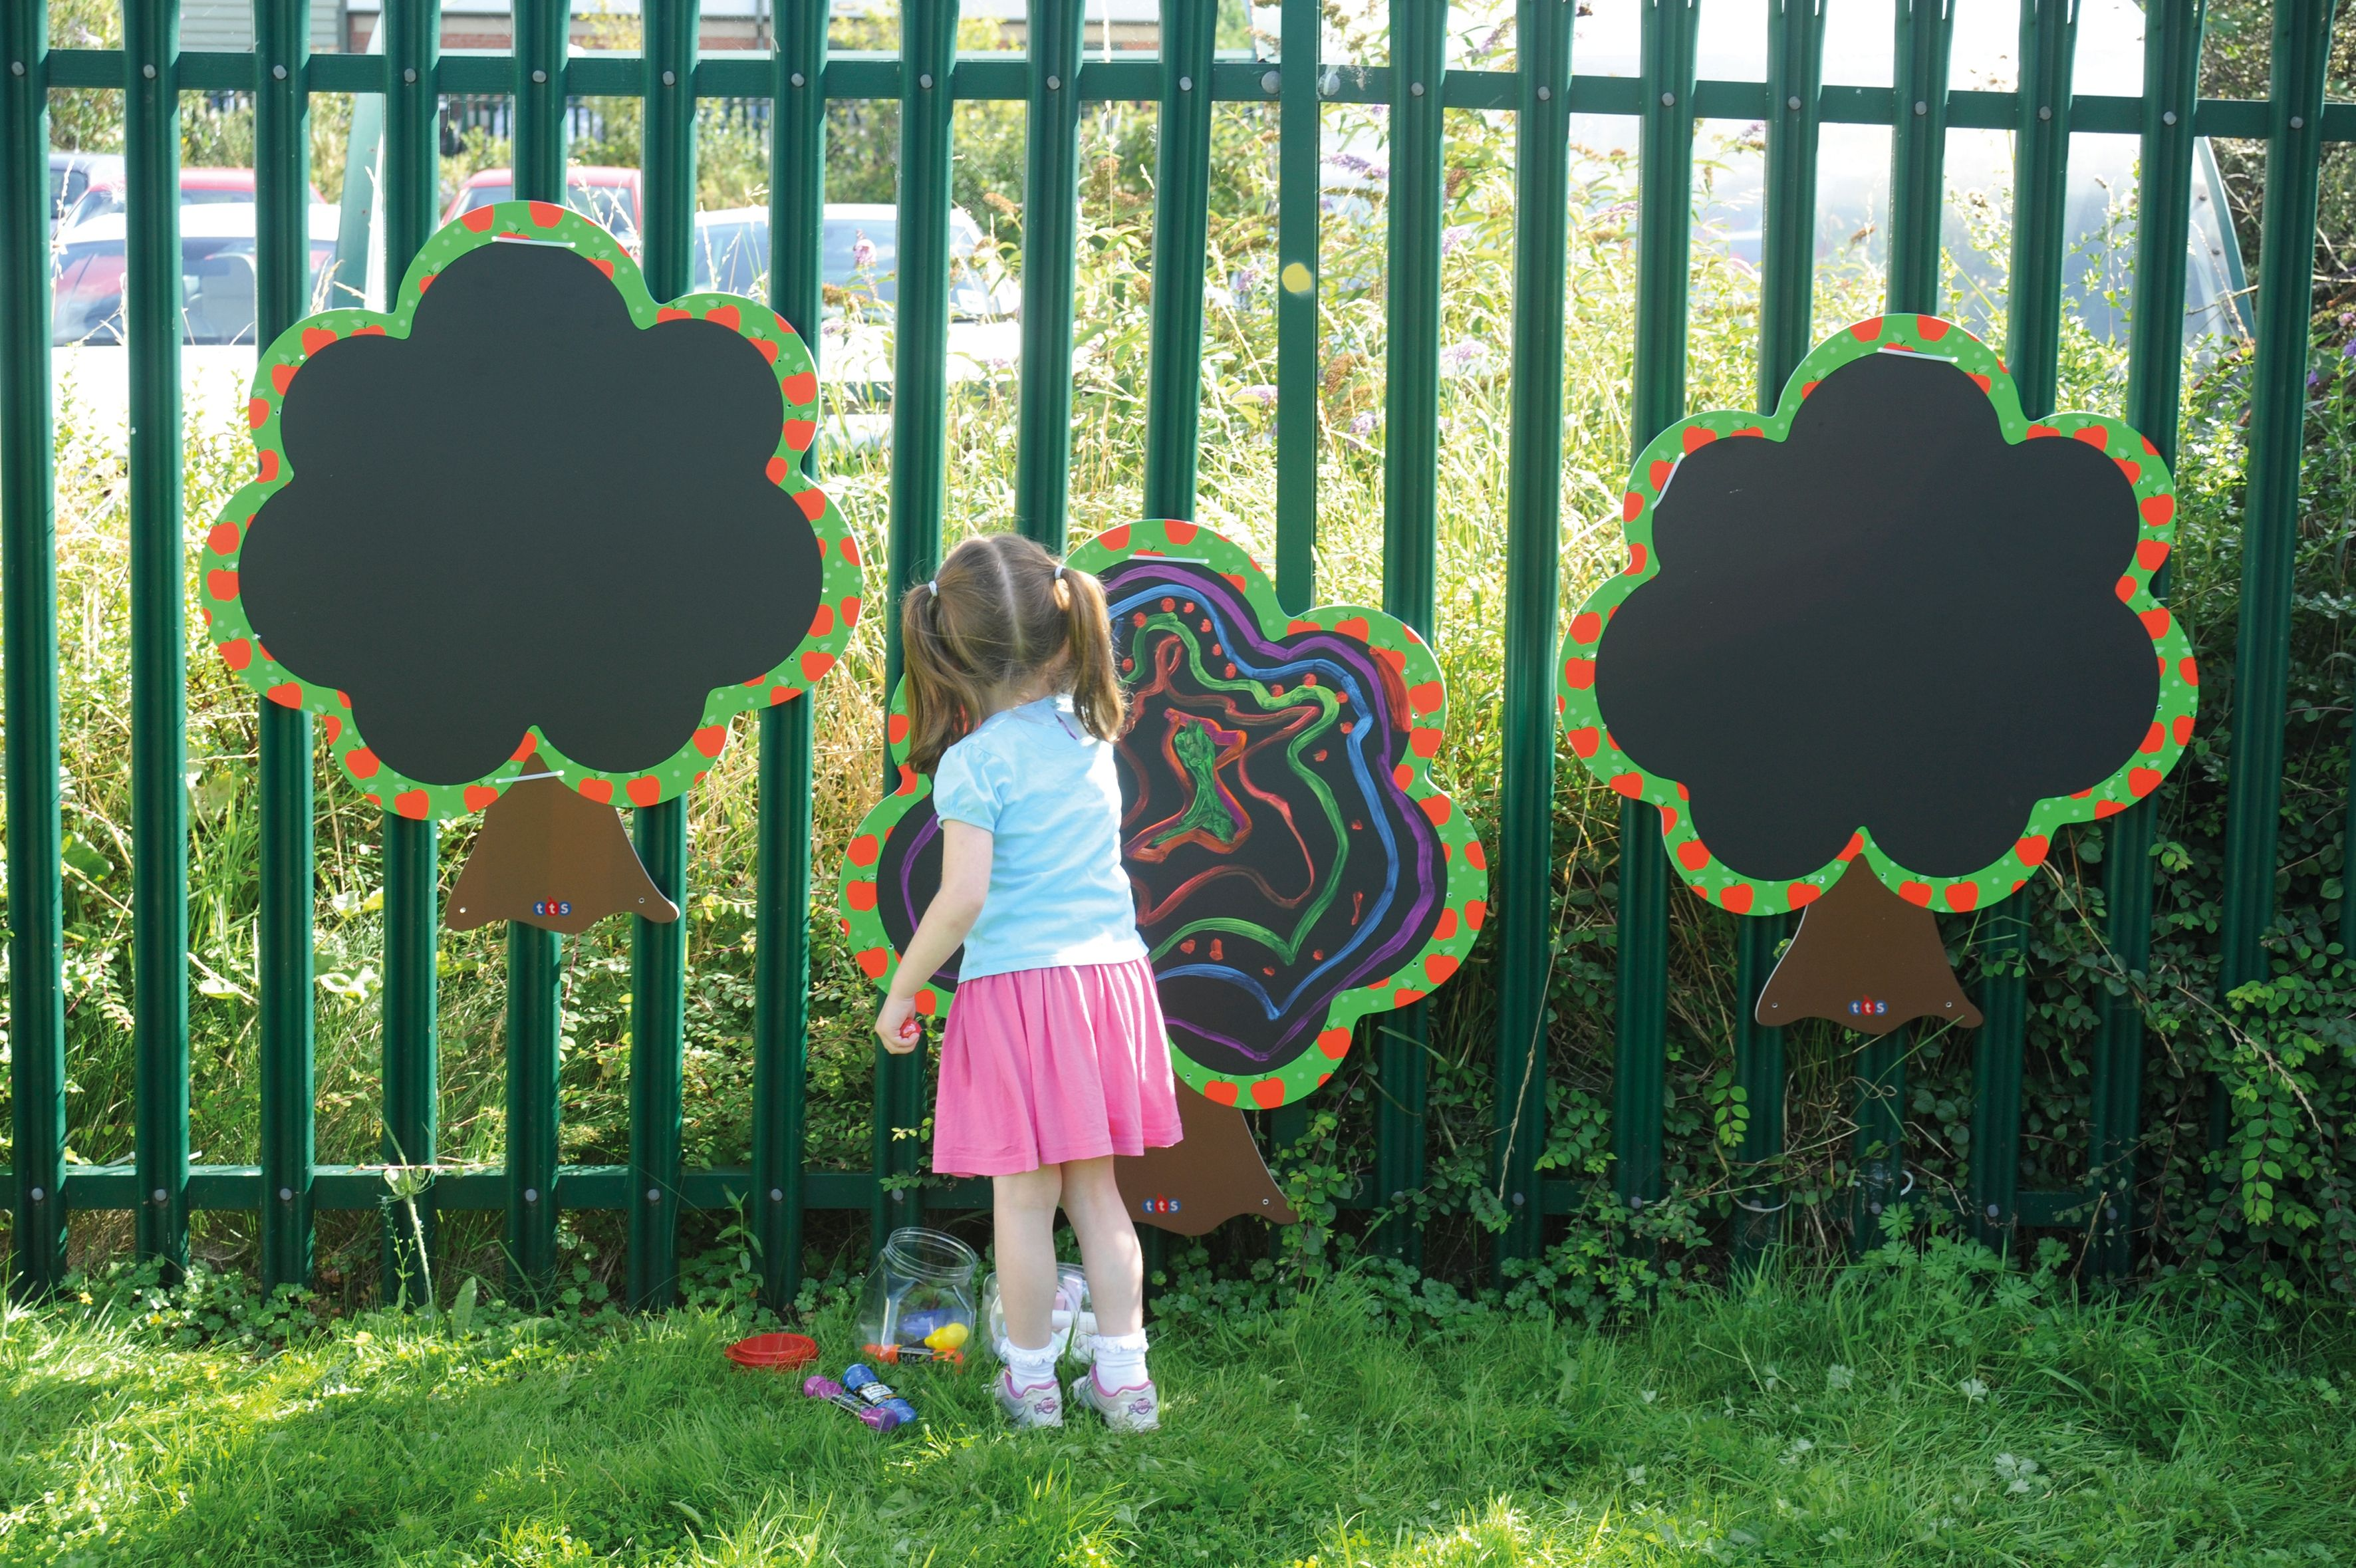 dekorative baumtafeln f r drinnen und drau en tafel kreide kreativ baum malen chalkboard